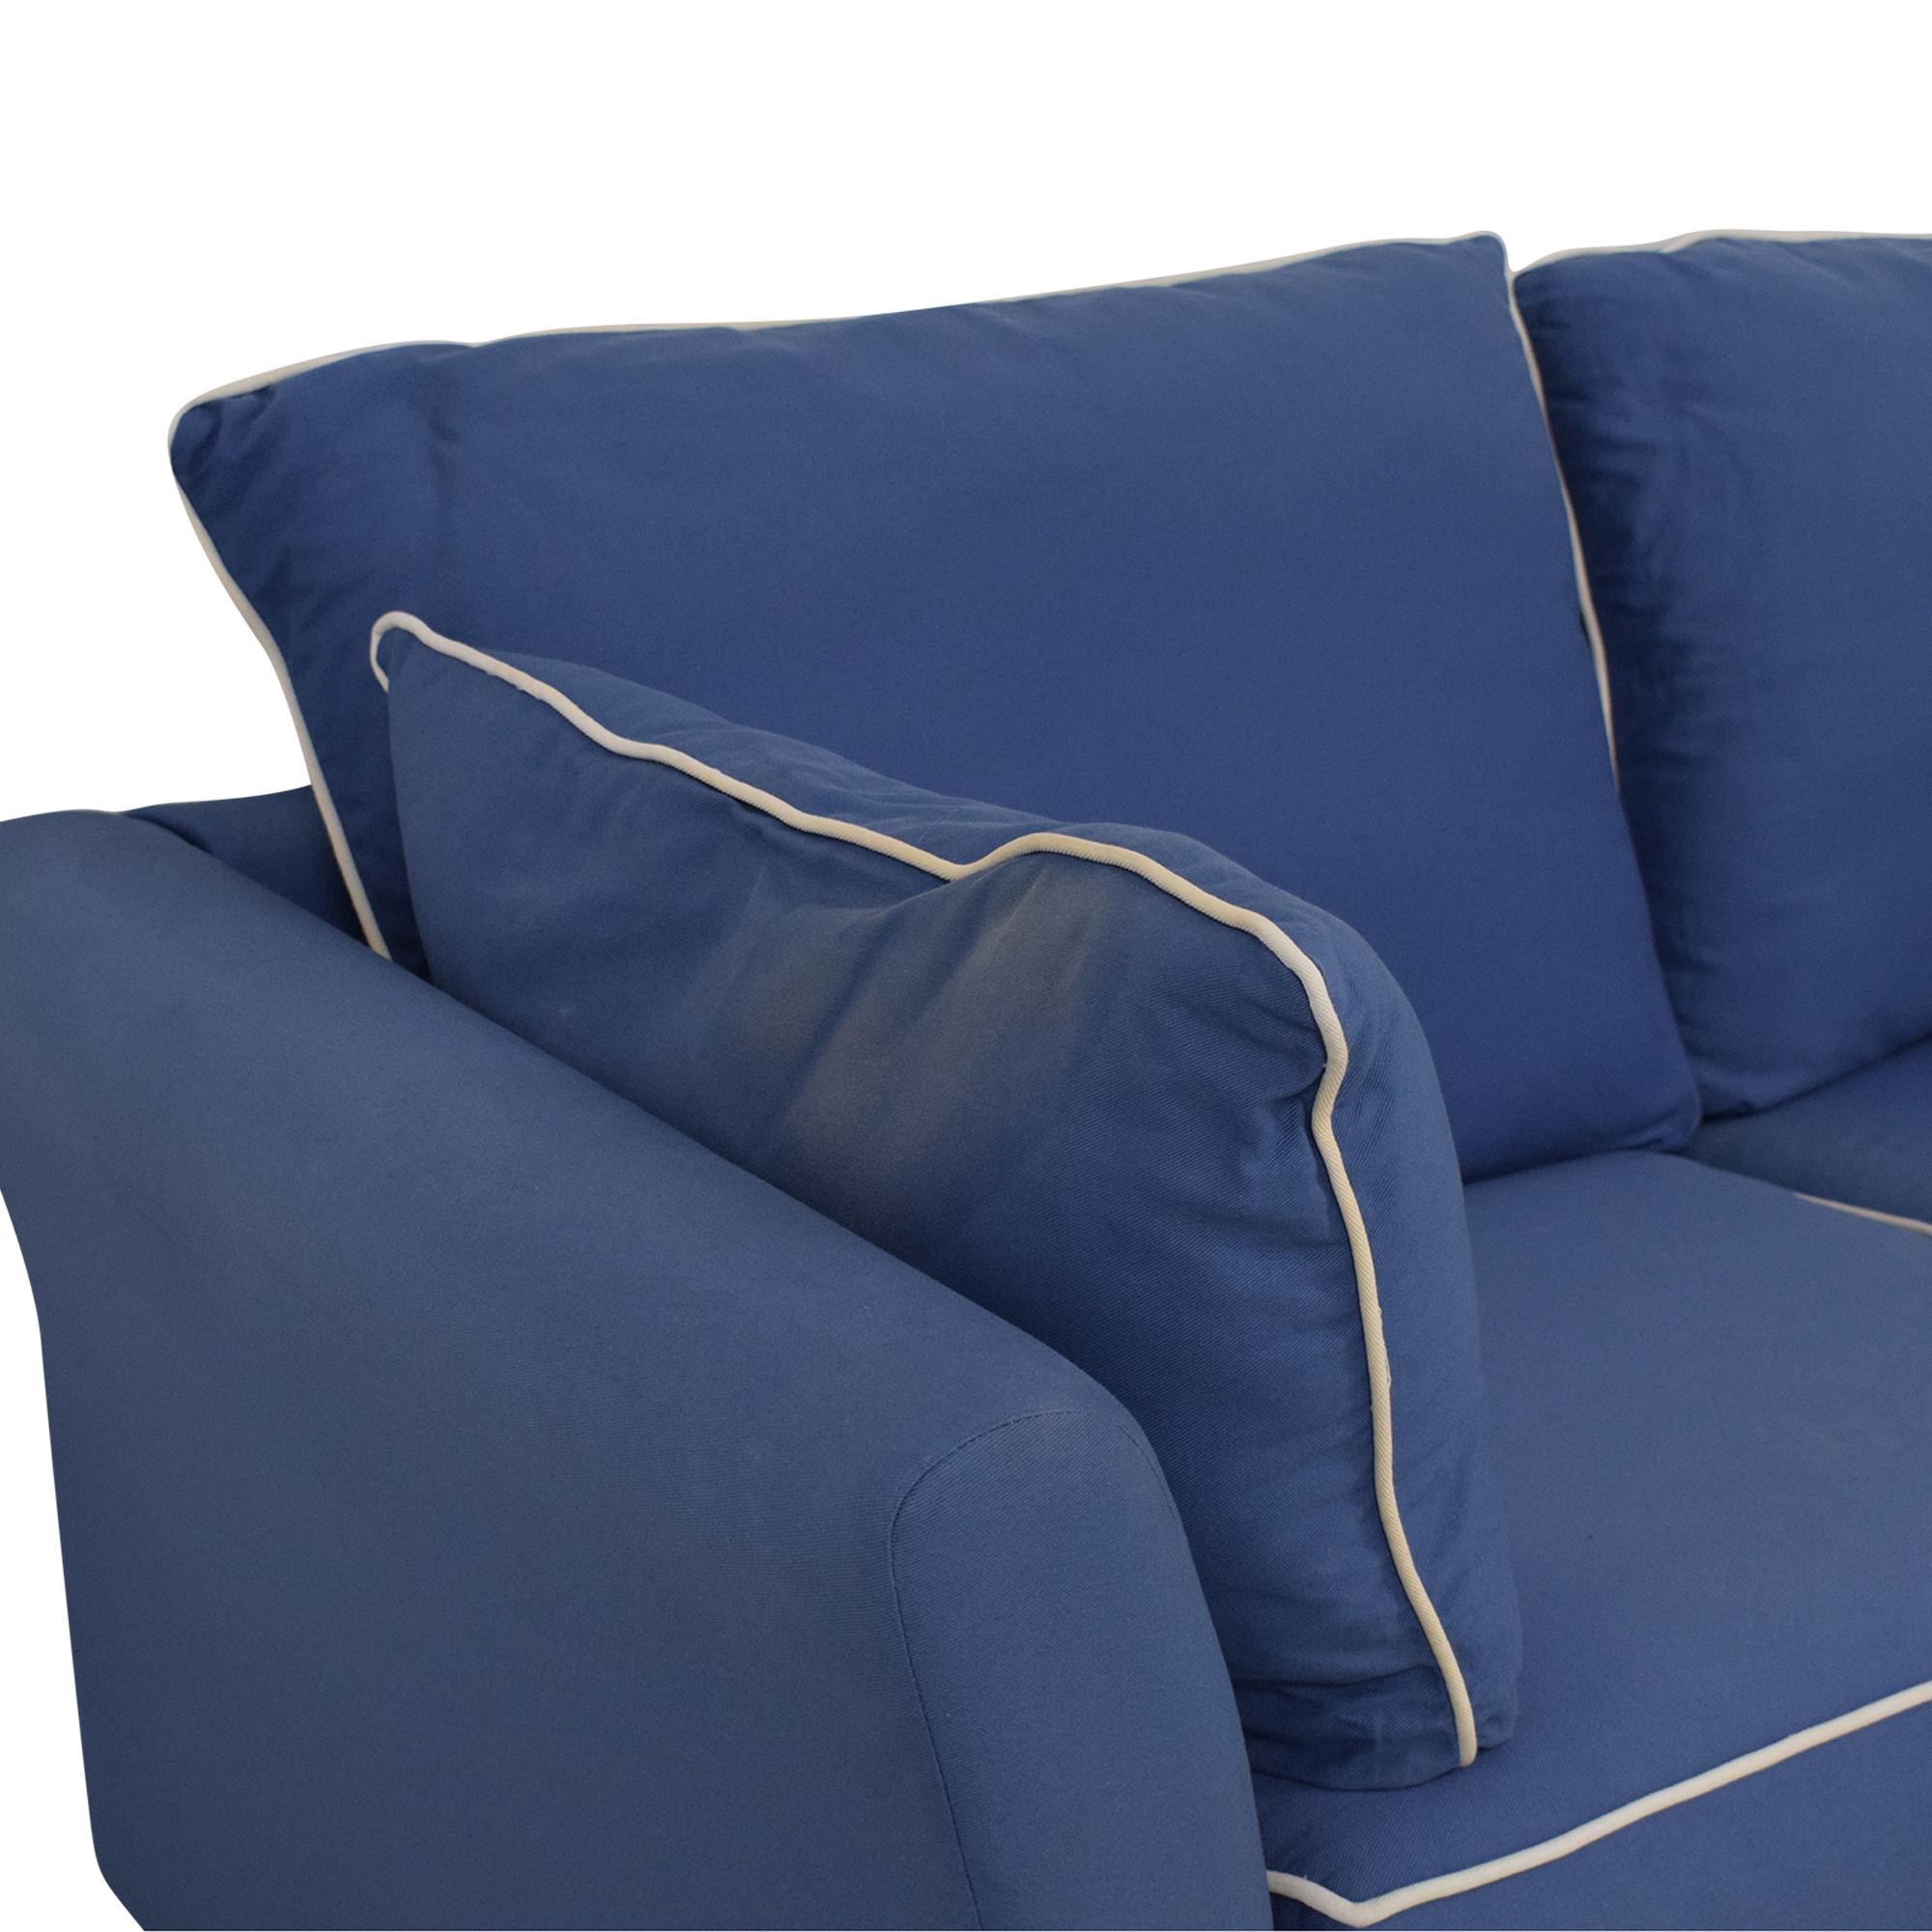 Hickory Springs Sleeper Sofa sale